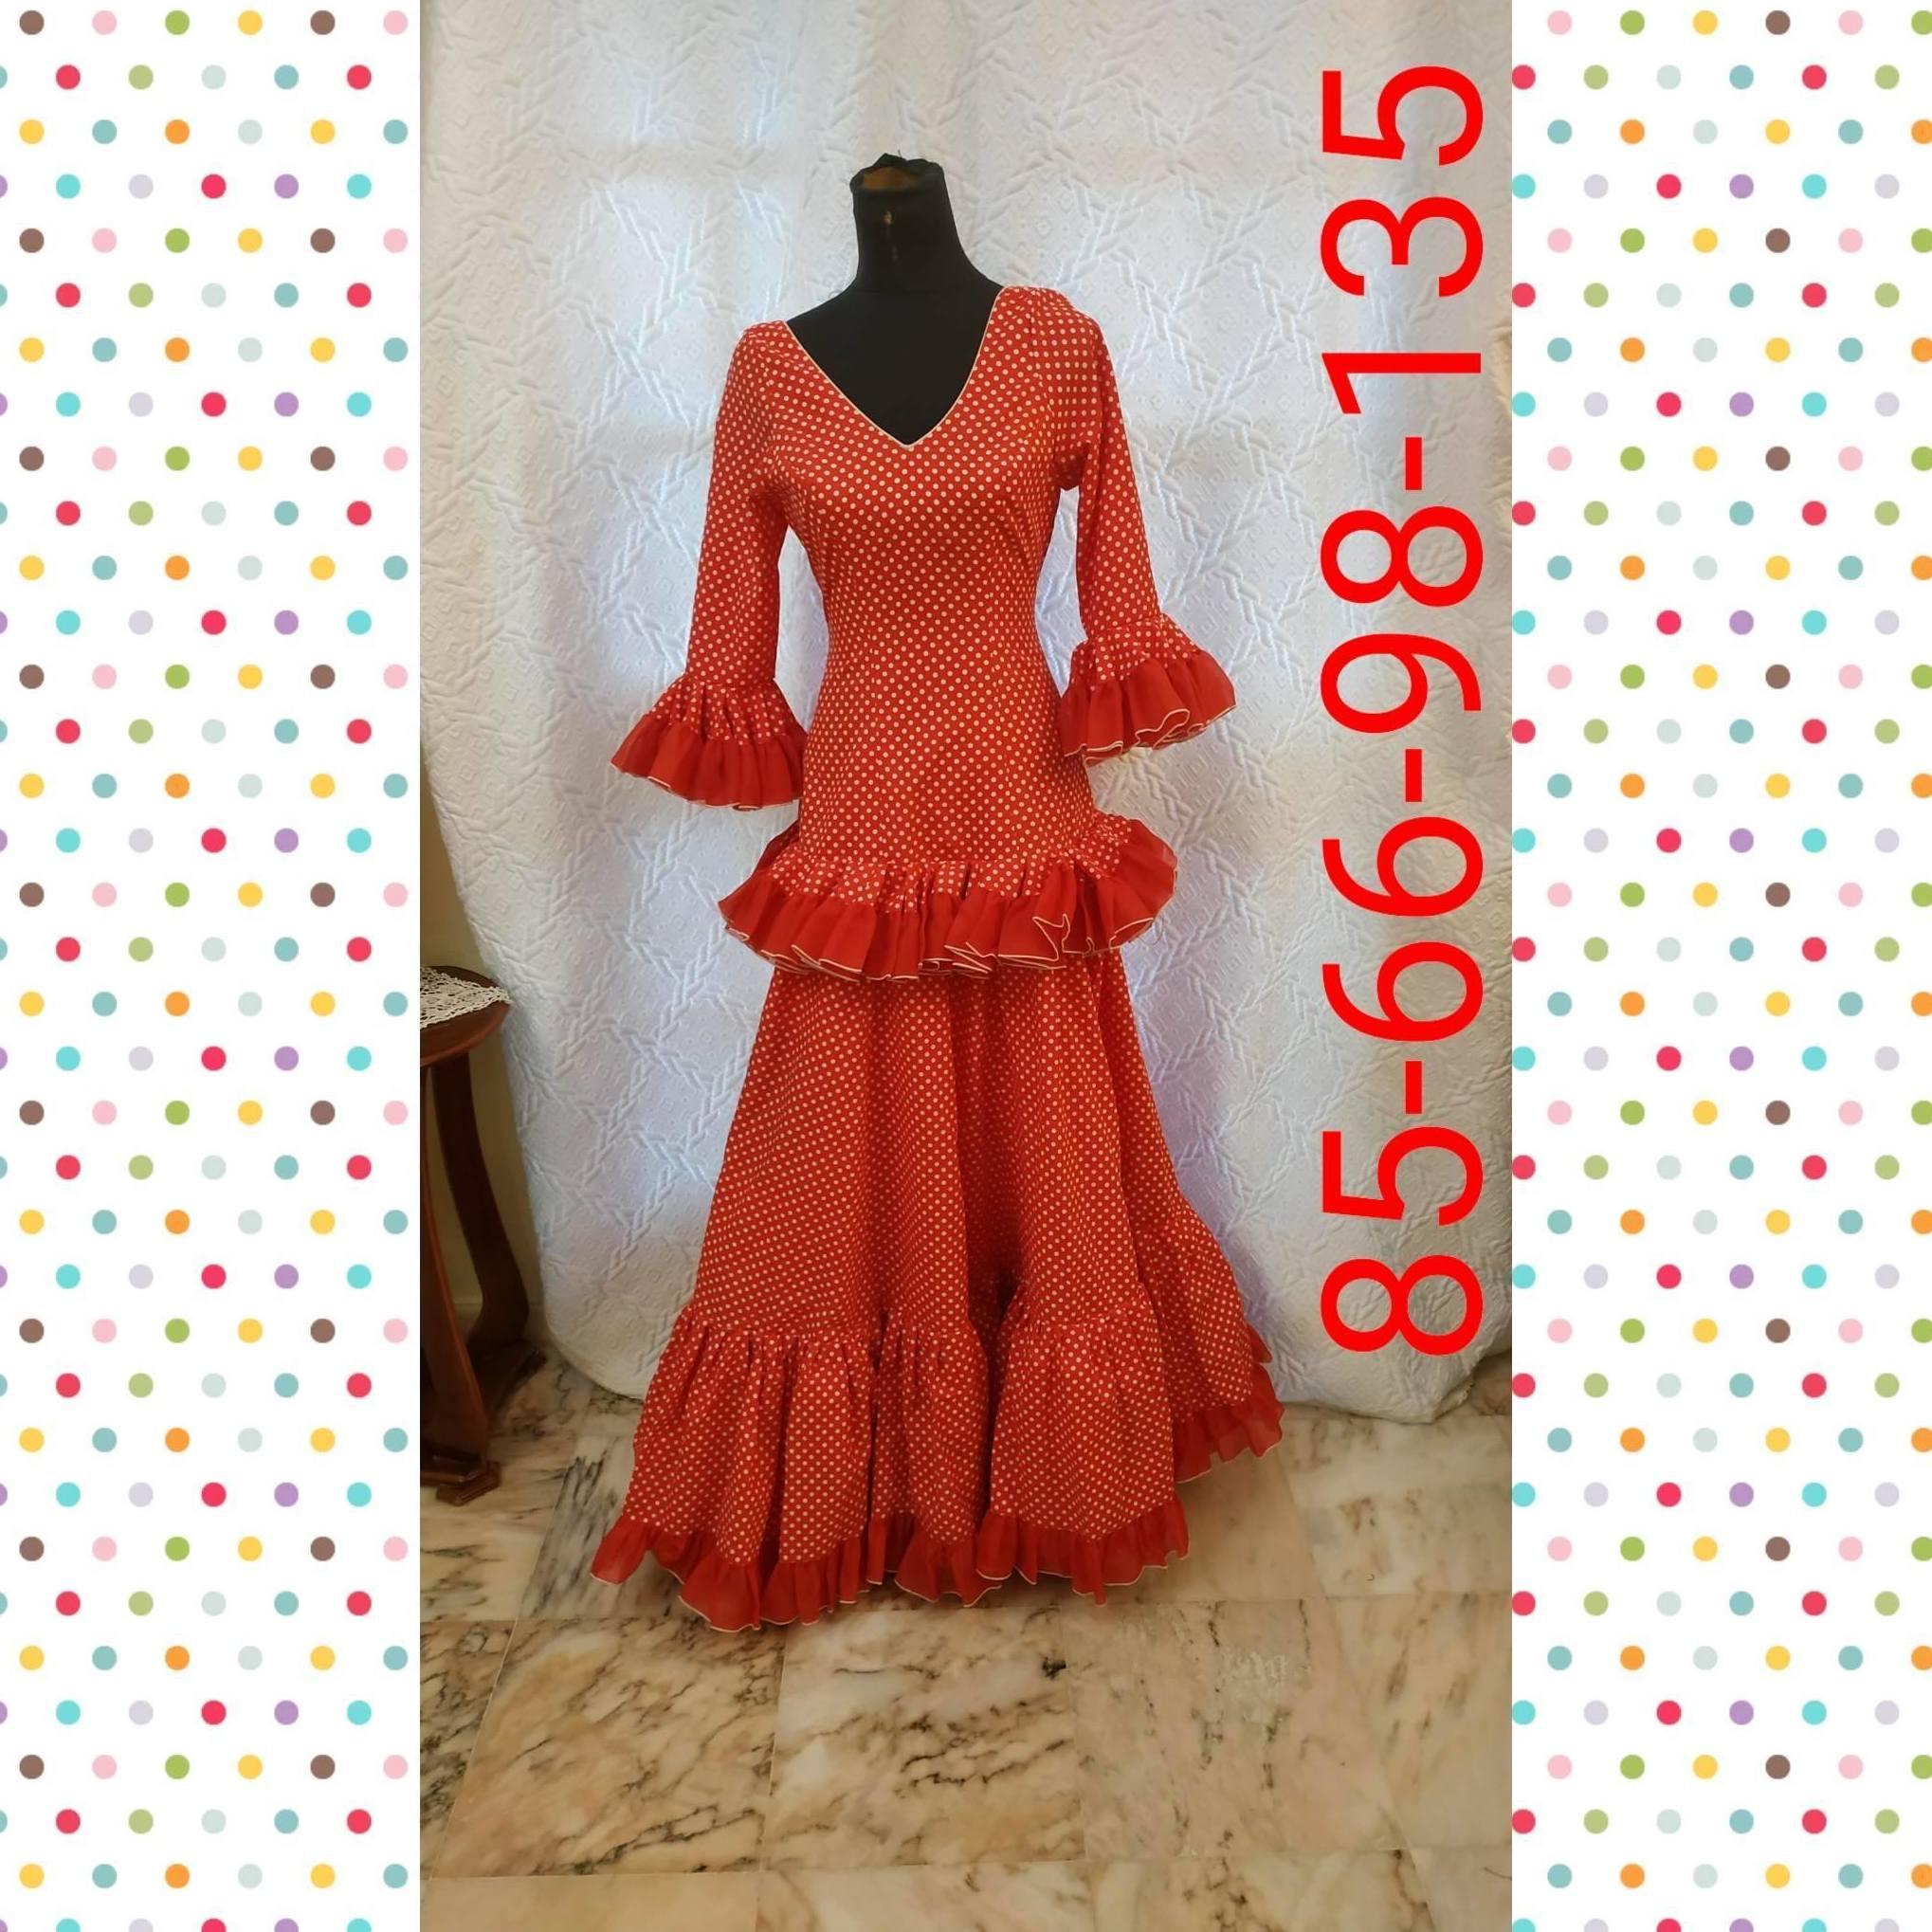 Traje de flamenca modelo 201909R8